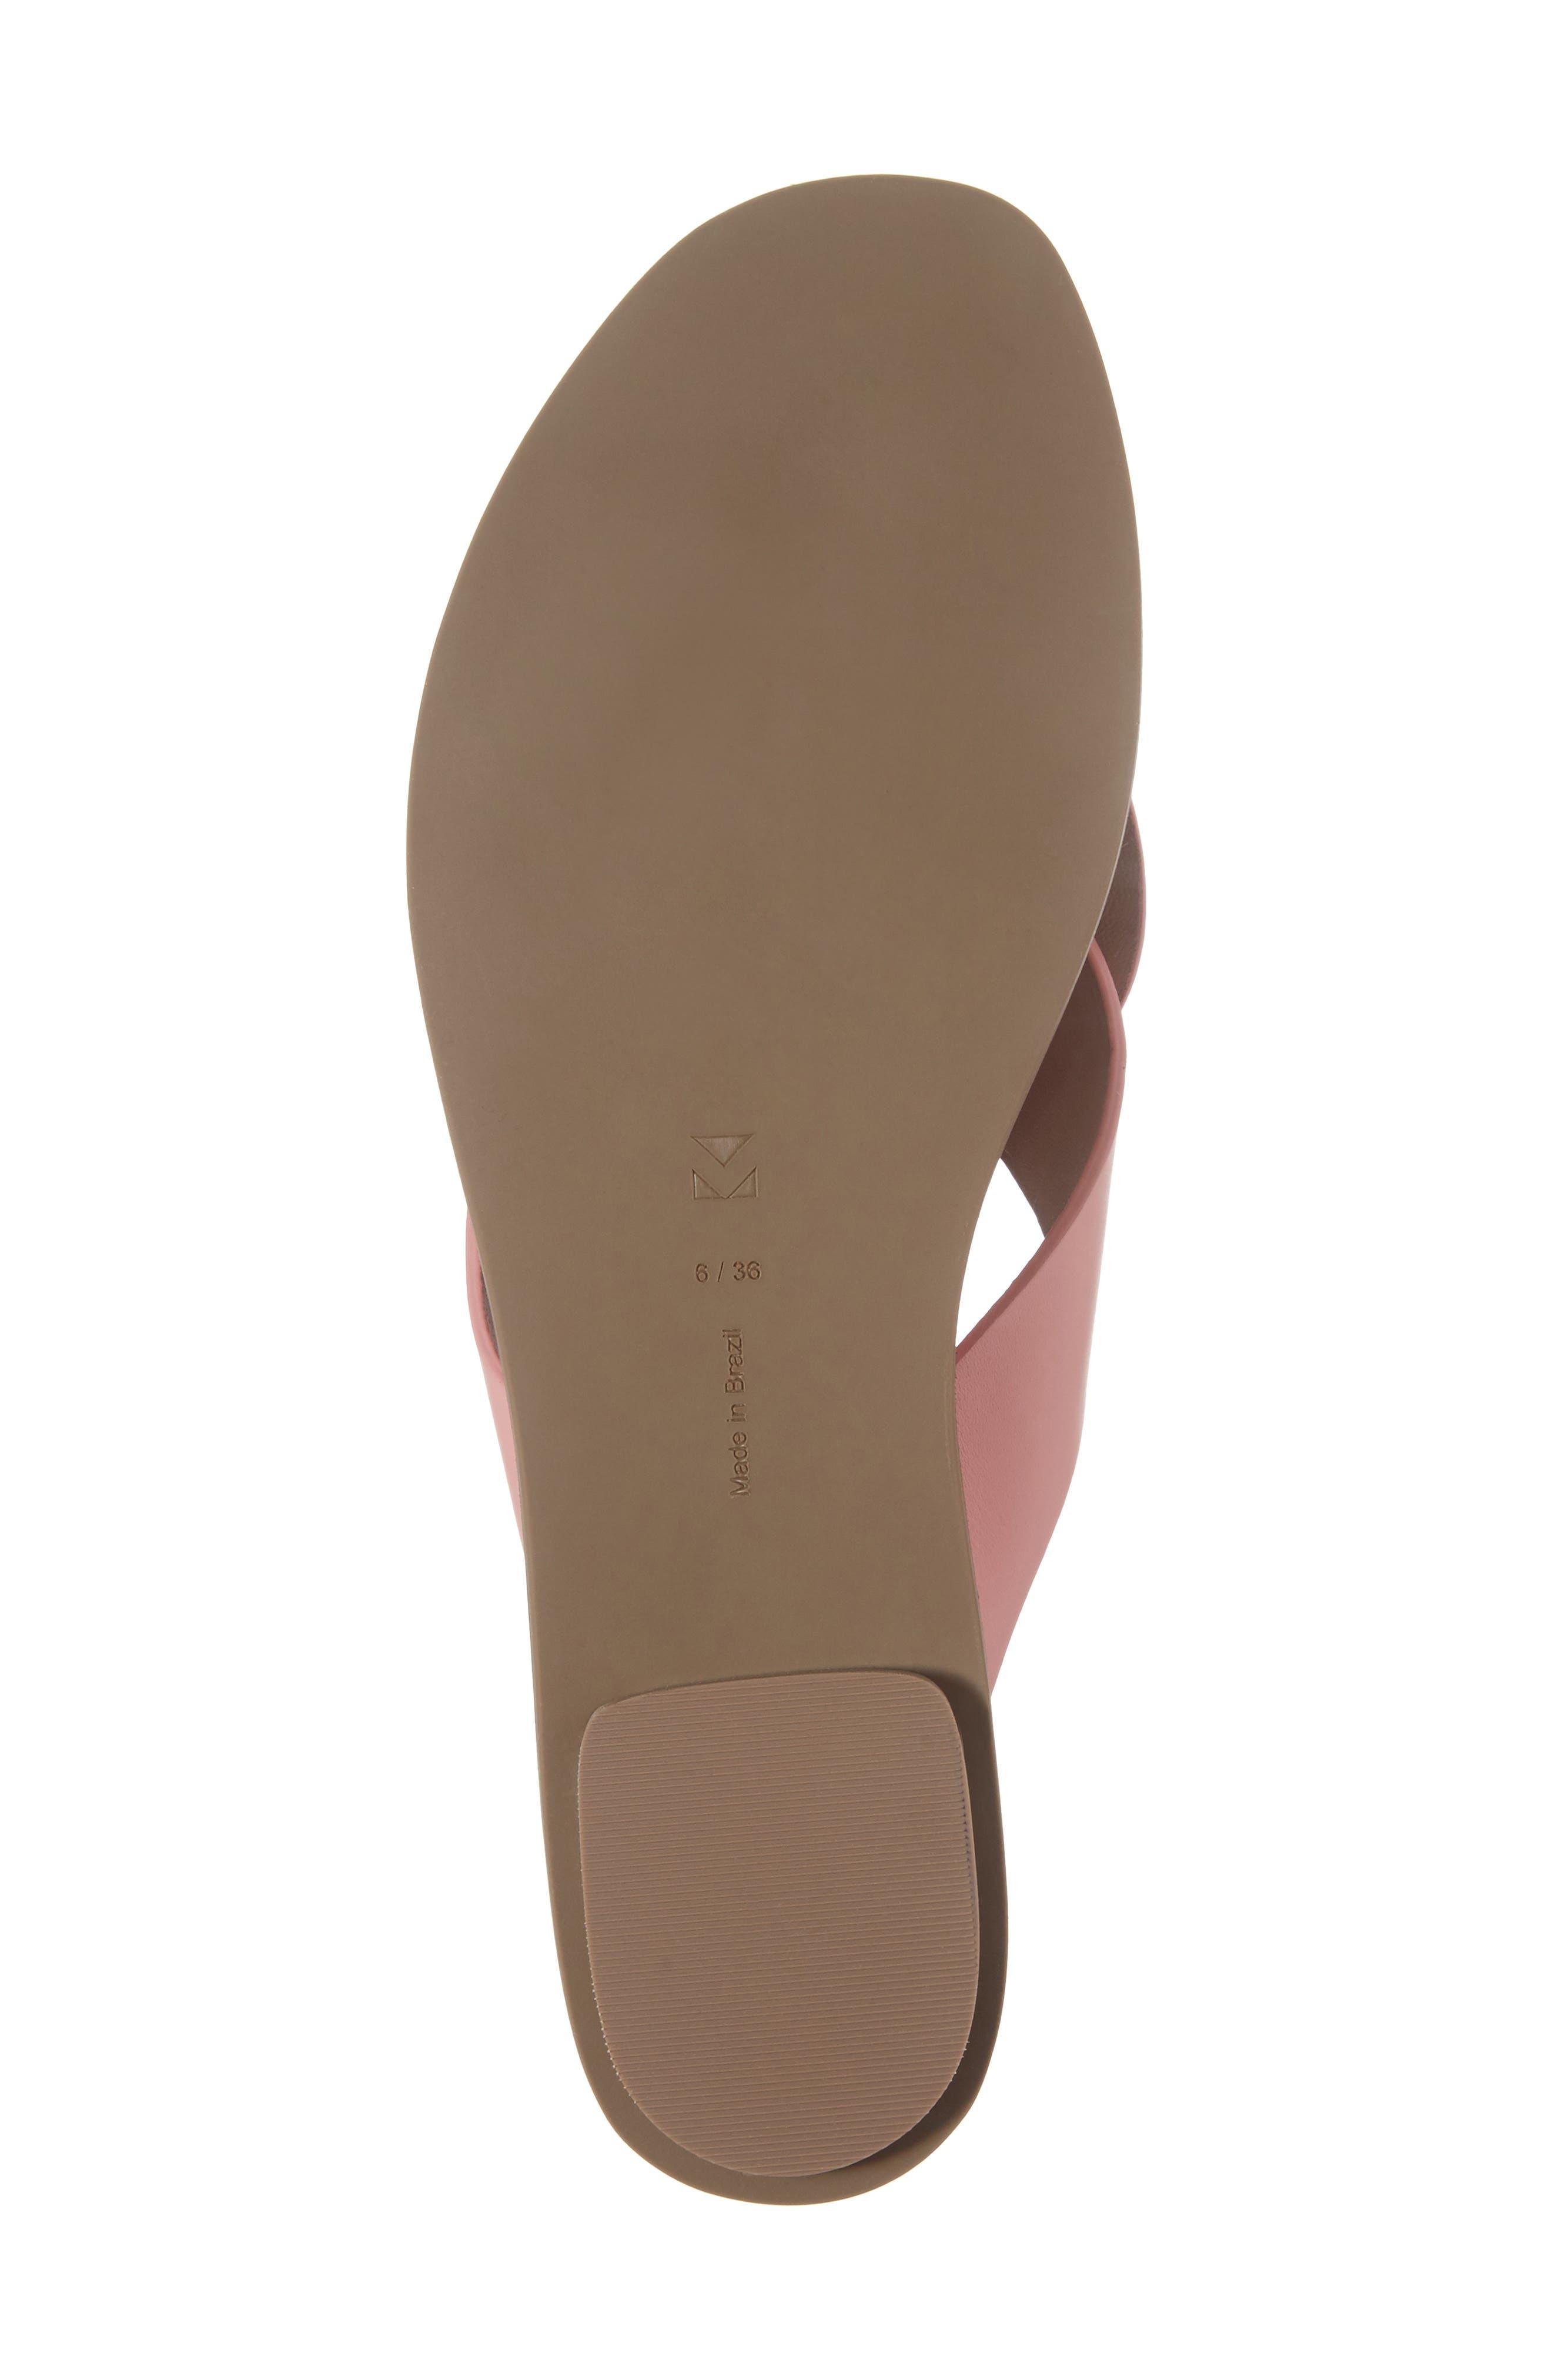 Carlein Slide Sandal,                             Alternate thumbnail 7, color,                             Pink Peony Leather